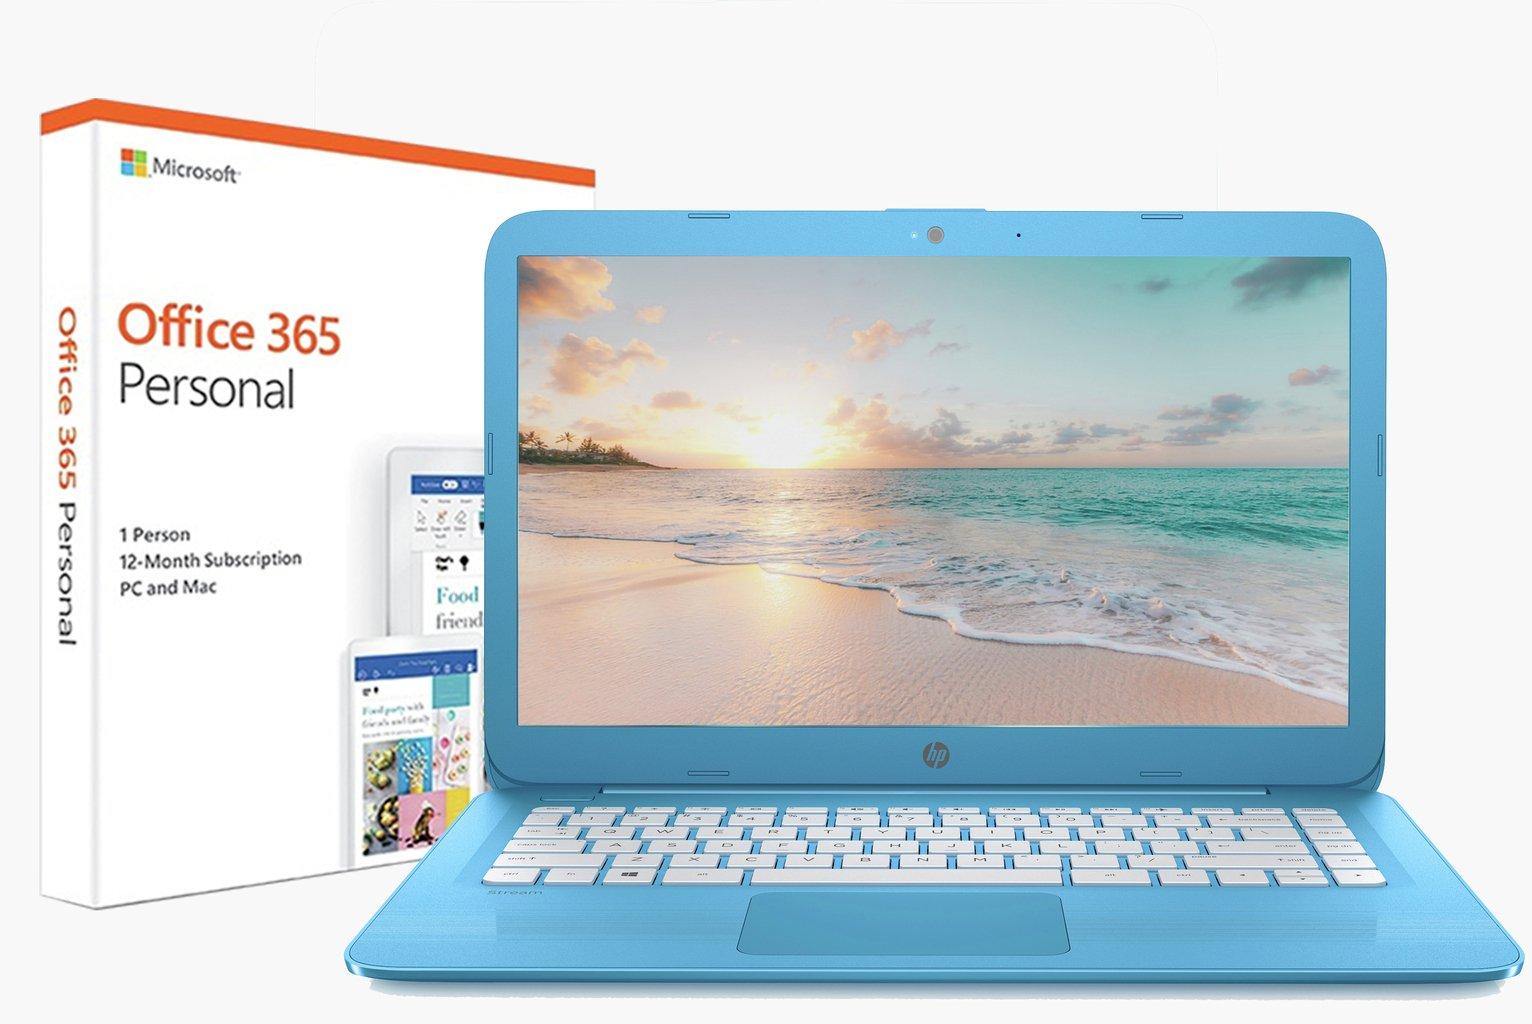 hp-stream-14-inch-intel-celeron-4gb-32gb-laptop-blue